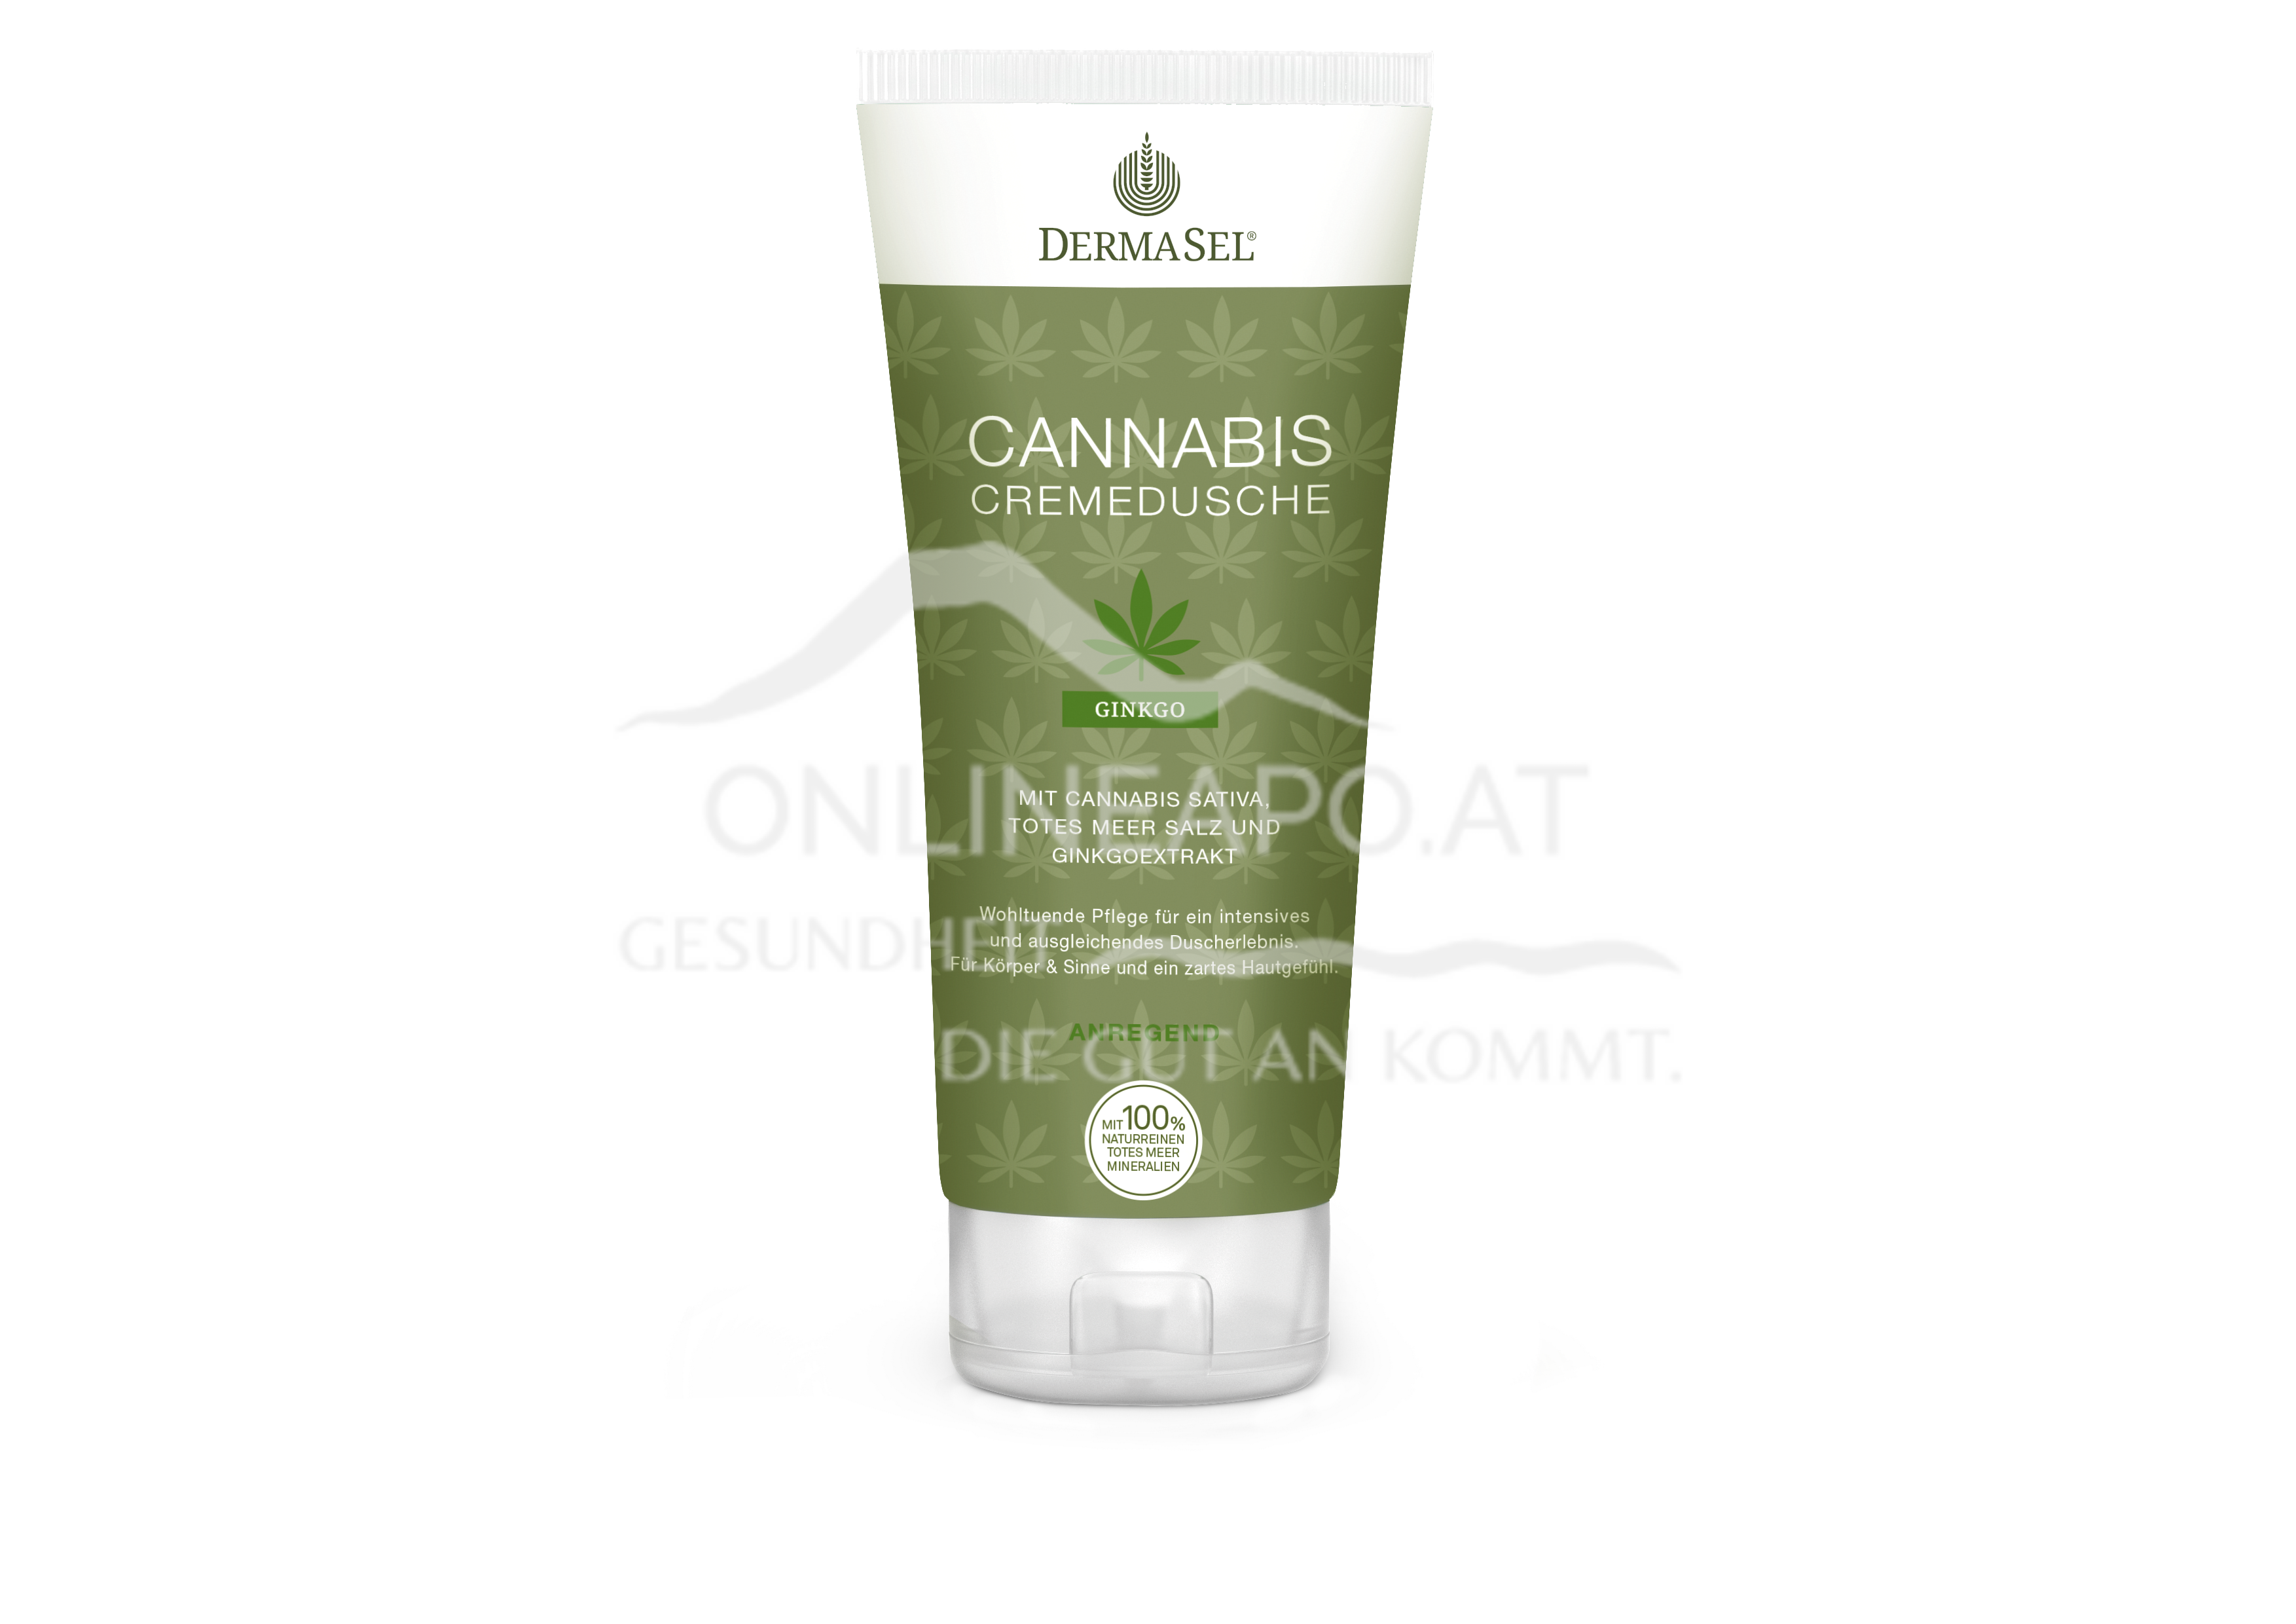 DermaSel® Cannabis Cremedusche Ginkgo